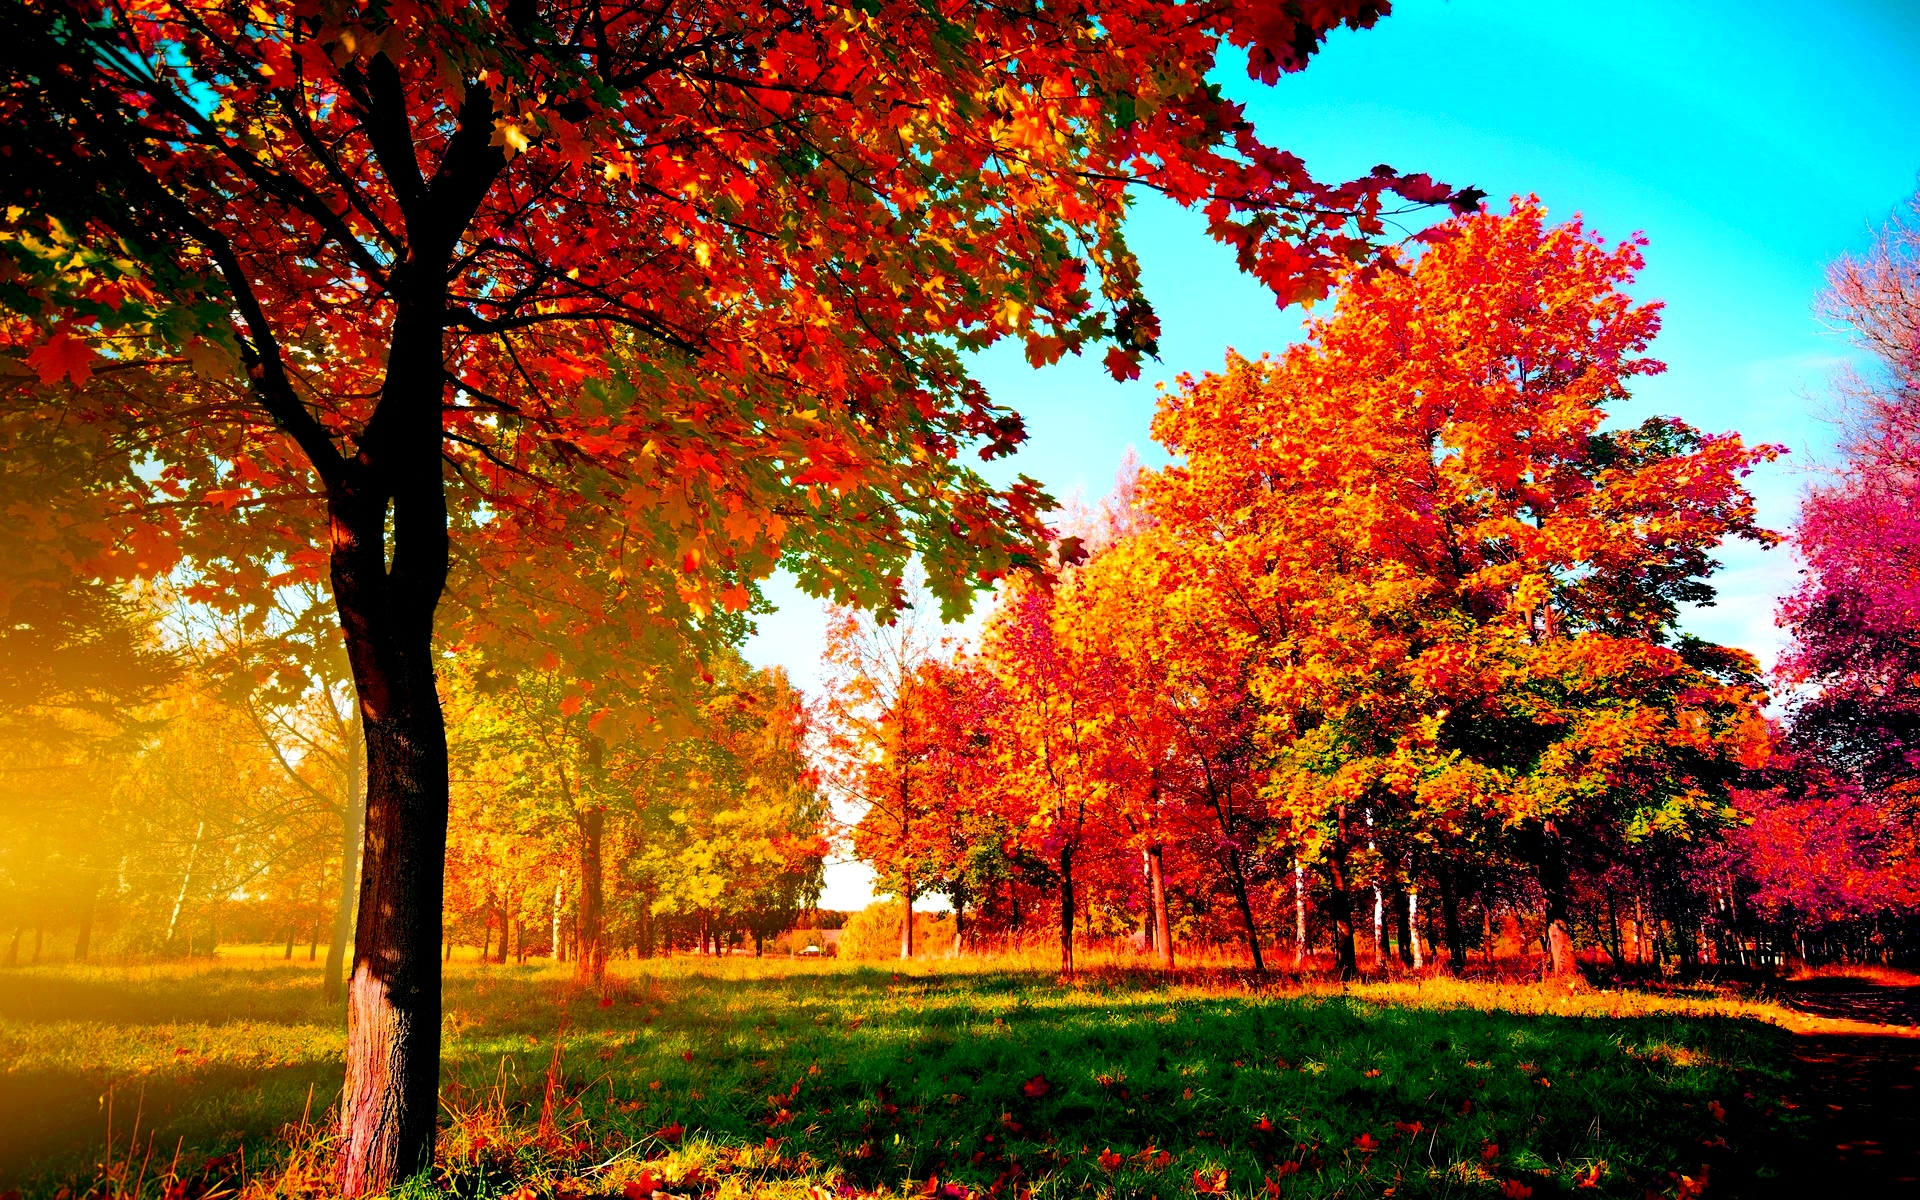 Autumn Tree Wallpaper - WallpaperSafari